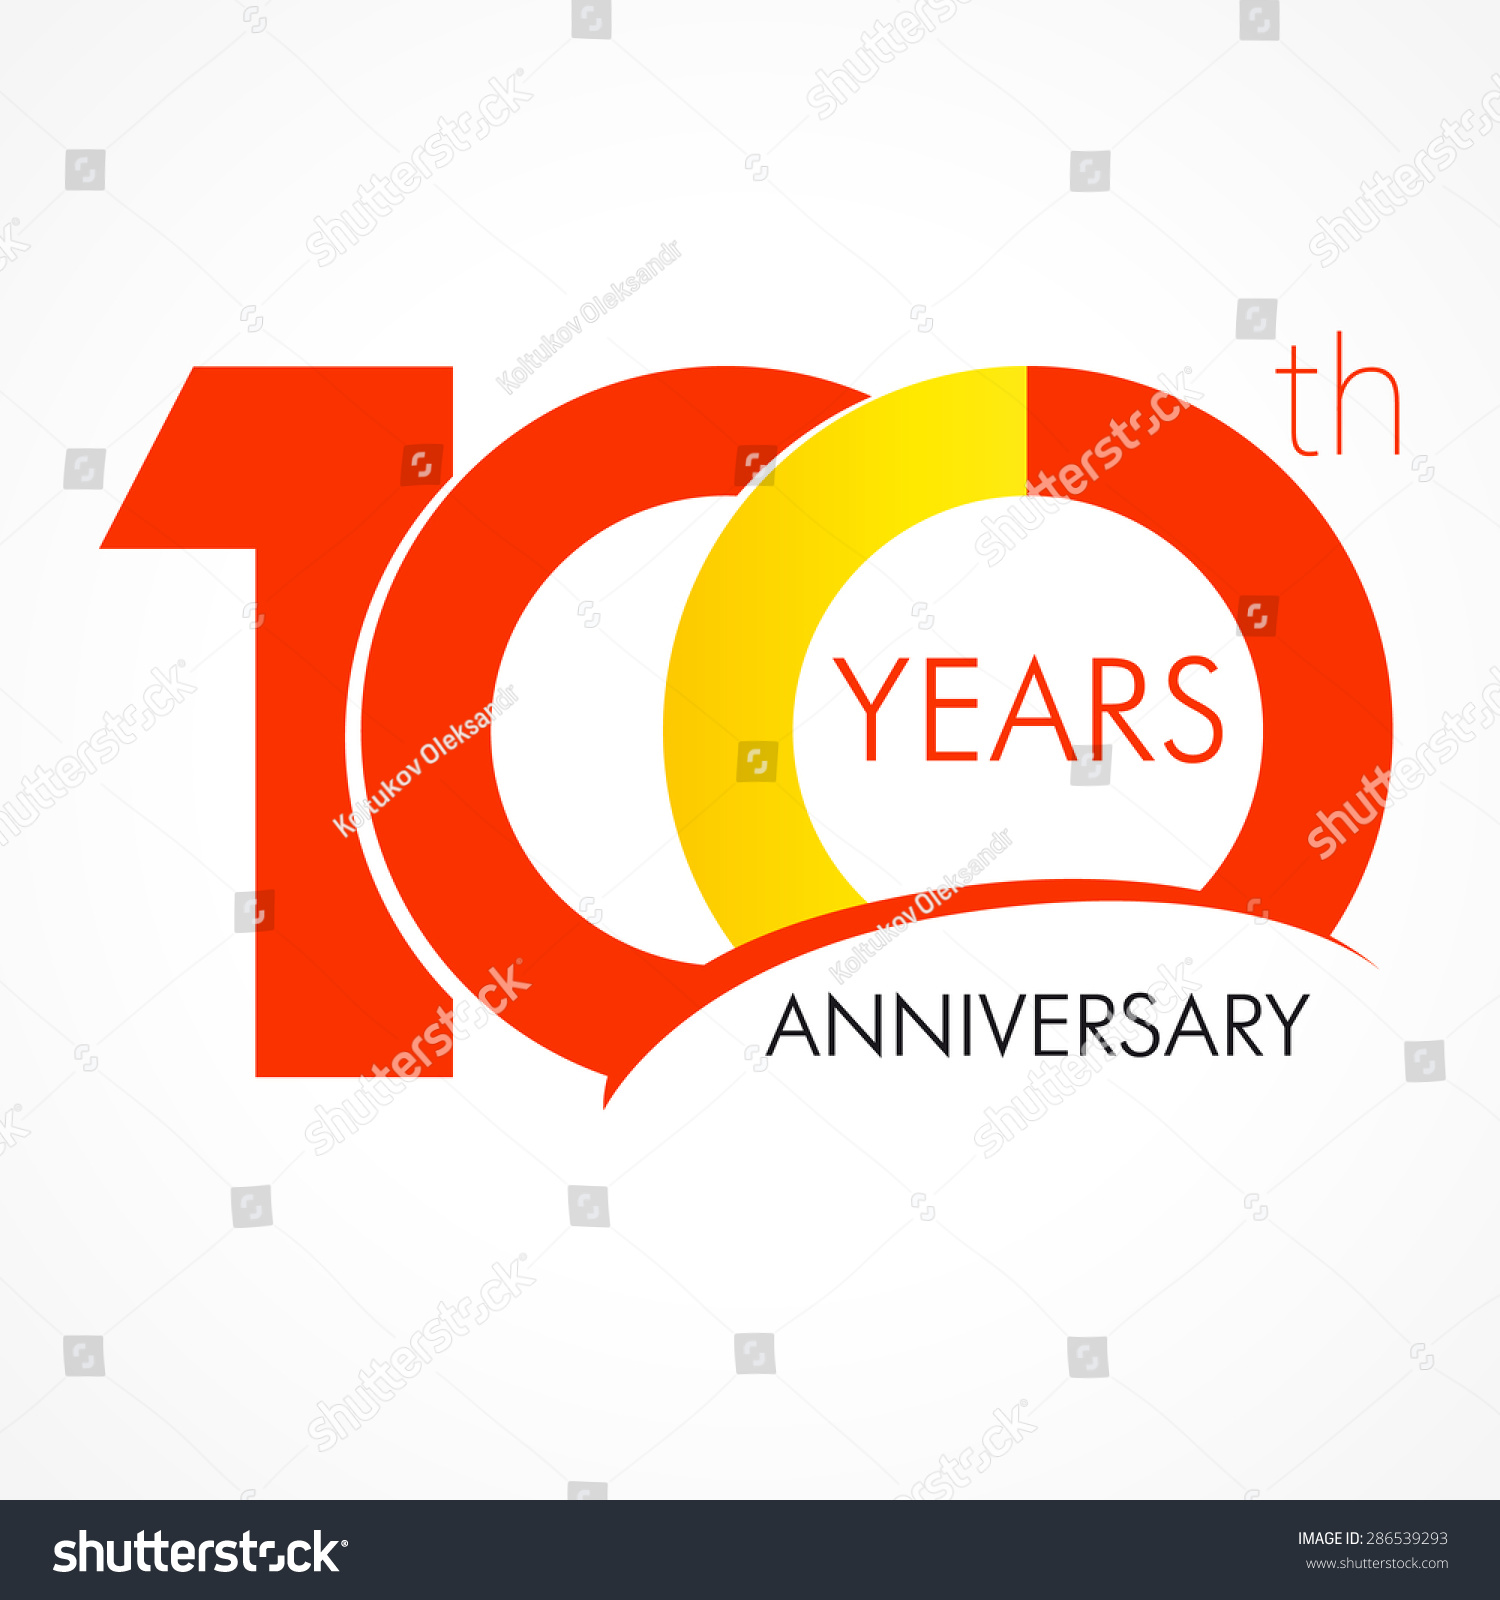 template logo 100th anniversary circle form stock vector 100th anniversary logo ideas 100th anniversary logo clip art